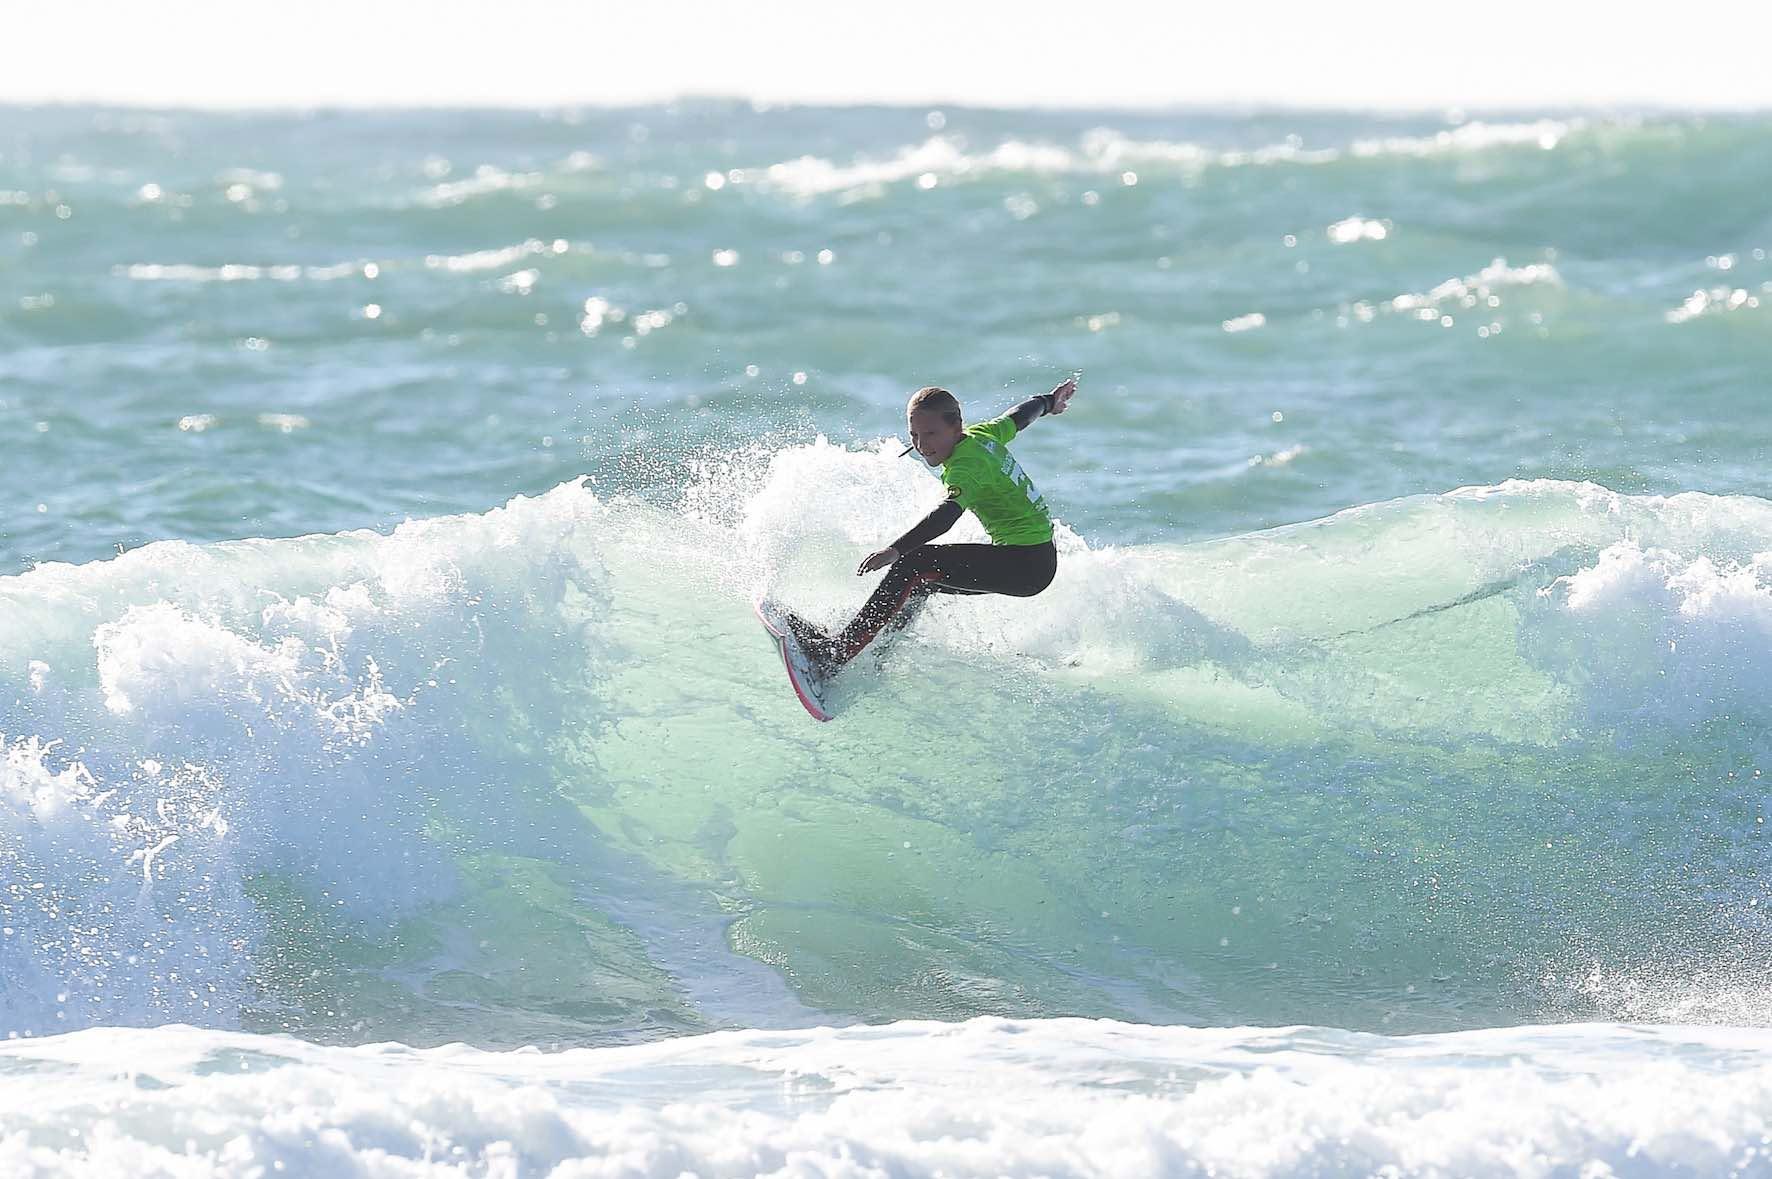 Gabi Herbst surfing in the 2018 Billabong Junior Series finale